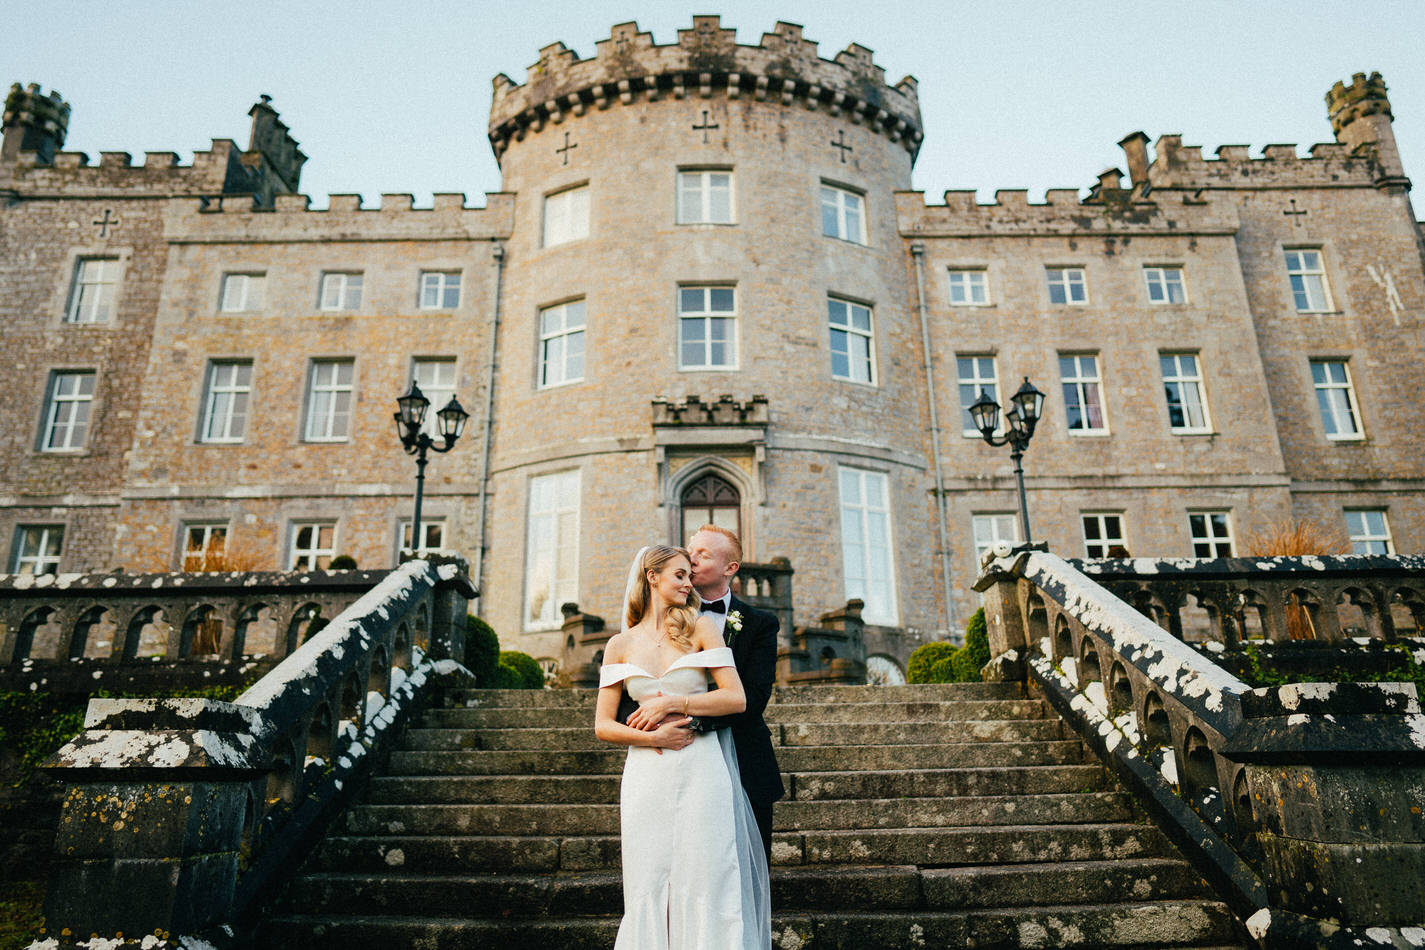 Castle-wedding-ireland-photos- 0199 141